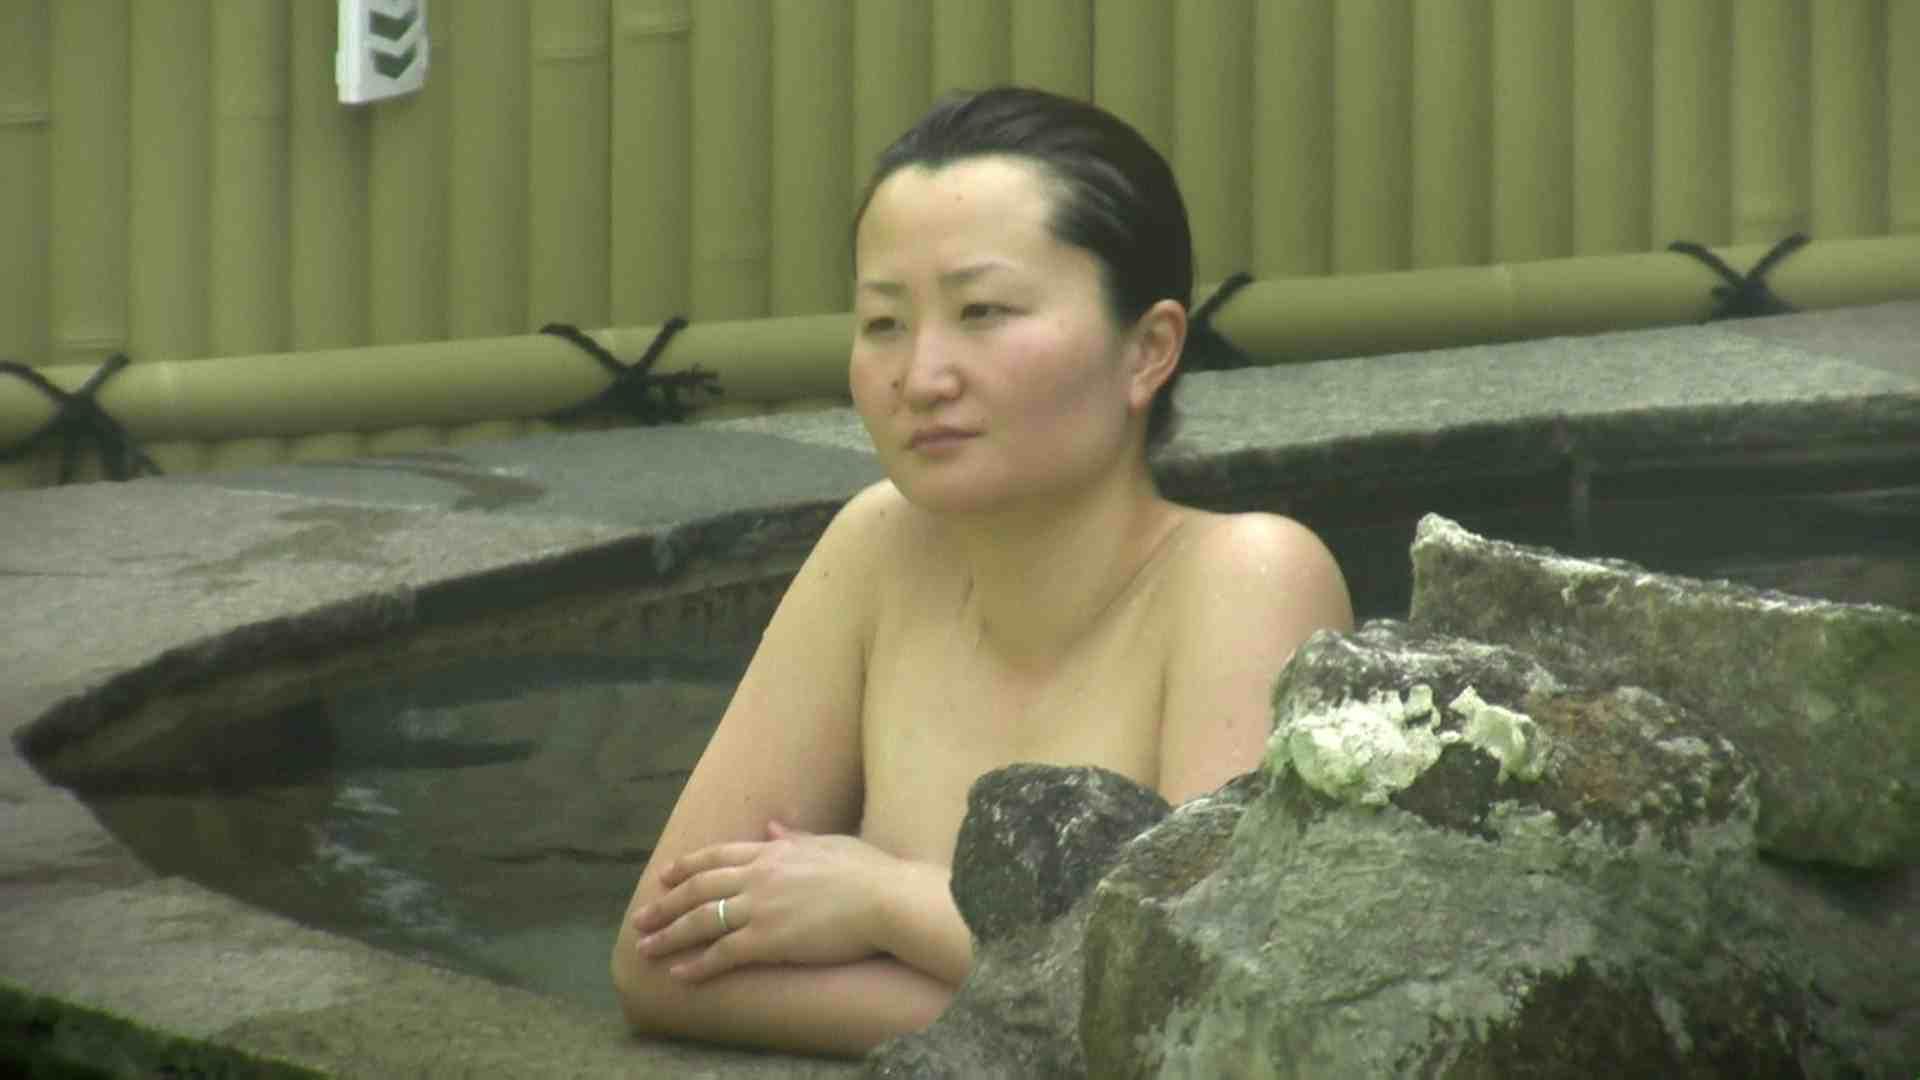 Aquaな露天風呂Vol.632 盗撮シリーズ | 露天風呂編  100PIX 9